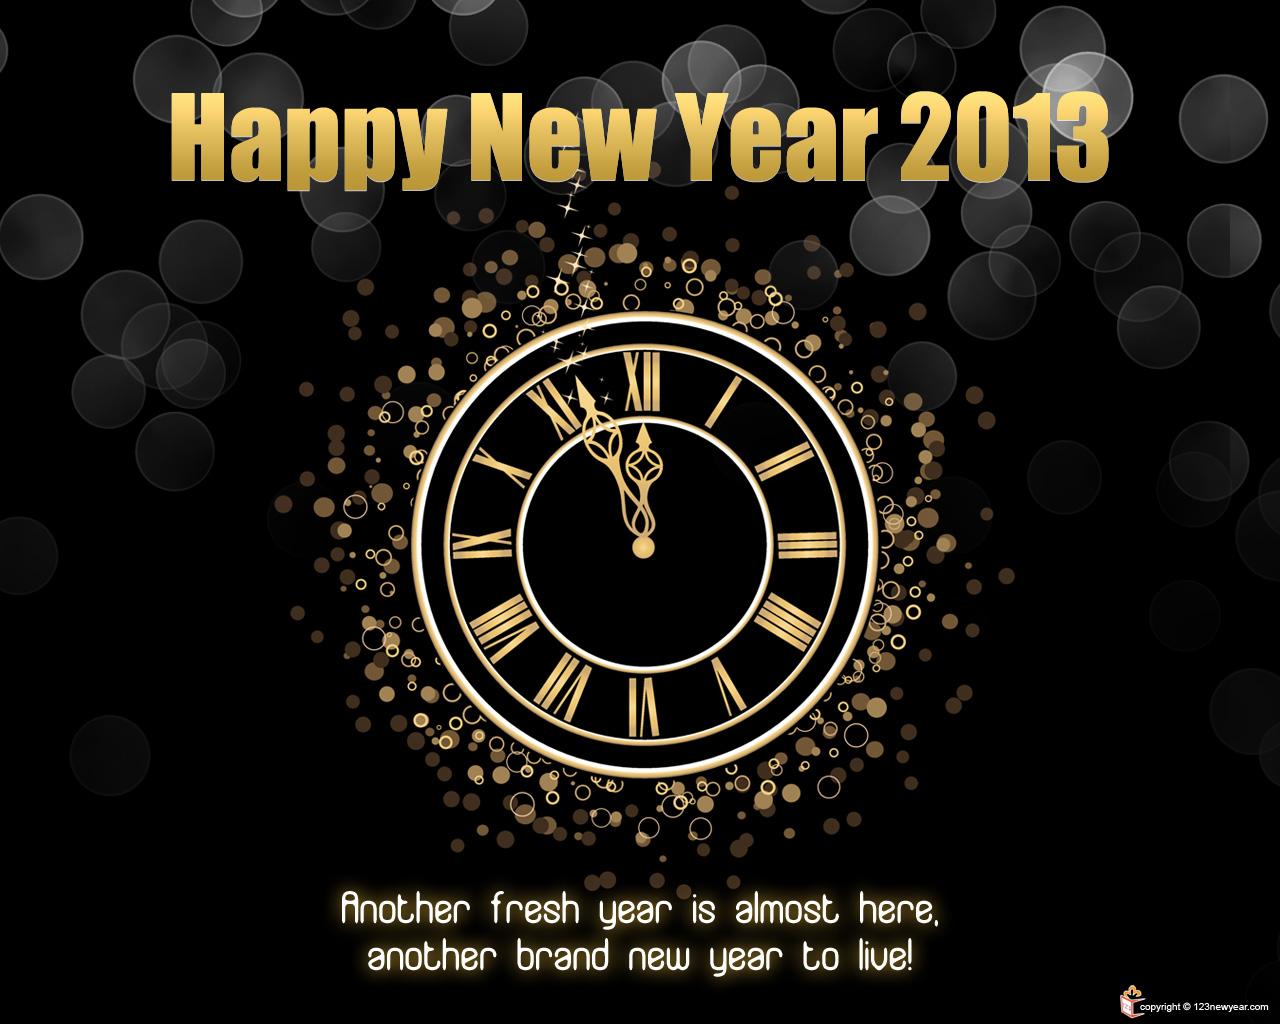 http://1.bp.blogspot.com/-vALU8uG1n5s/UOCcafQkZaI/AAAAAAAACdc/4BkK4w7PZ0w/s1600/2013-new-year-clock-wallpaper-1024x768.jpg